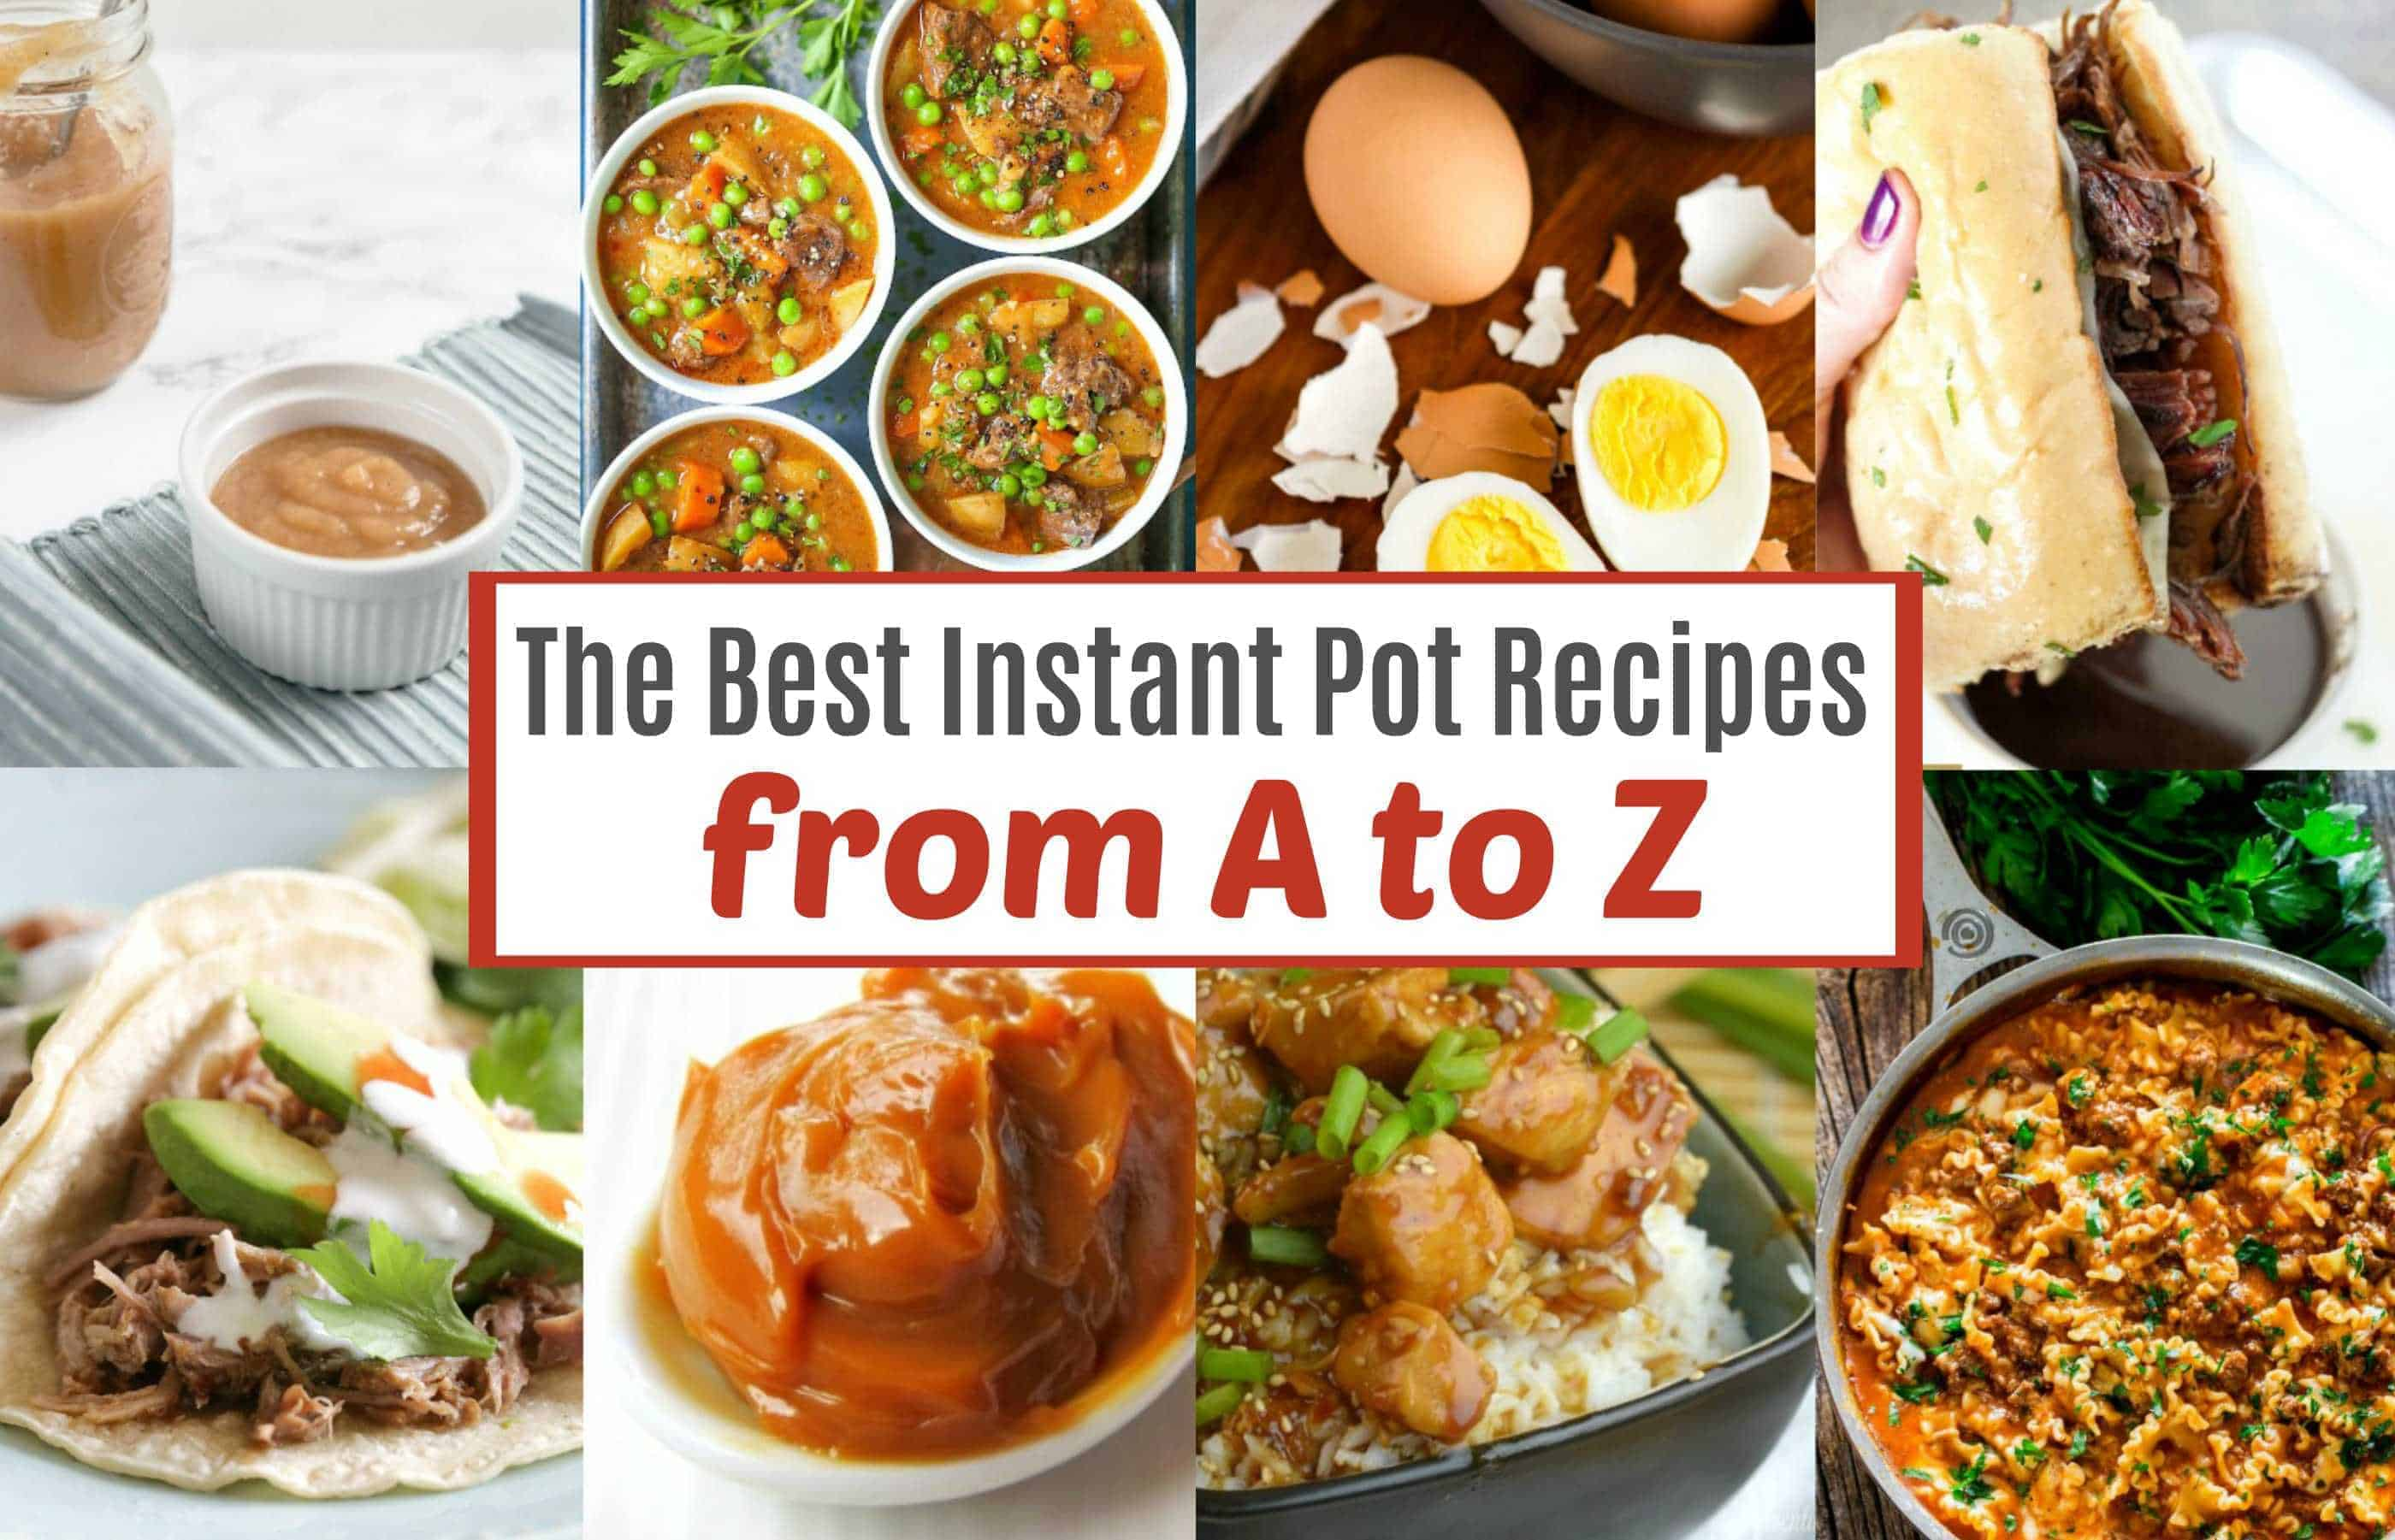 The best Instant Pot recipes on Pinterest